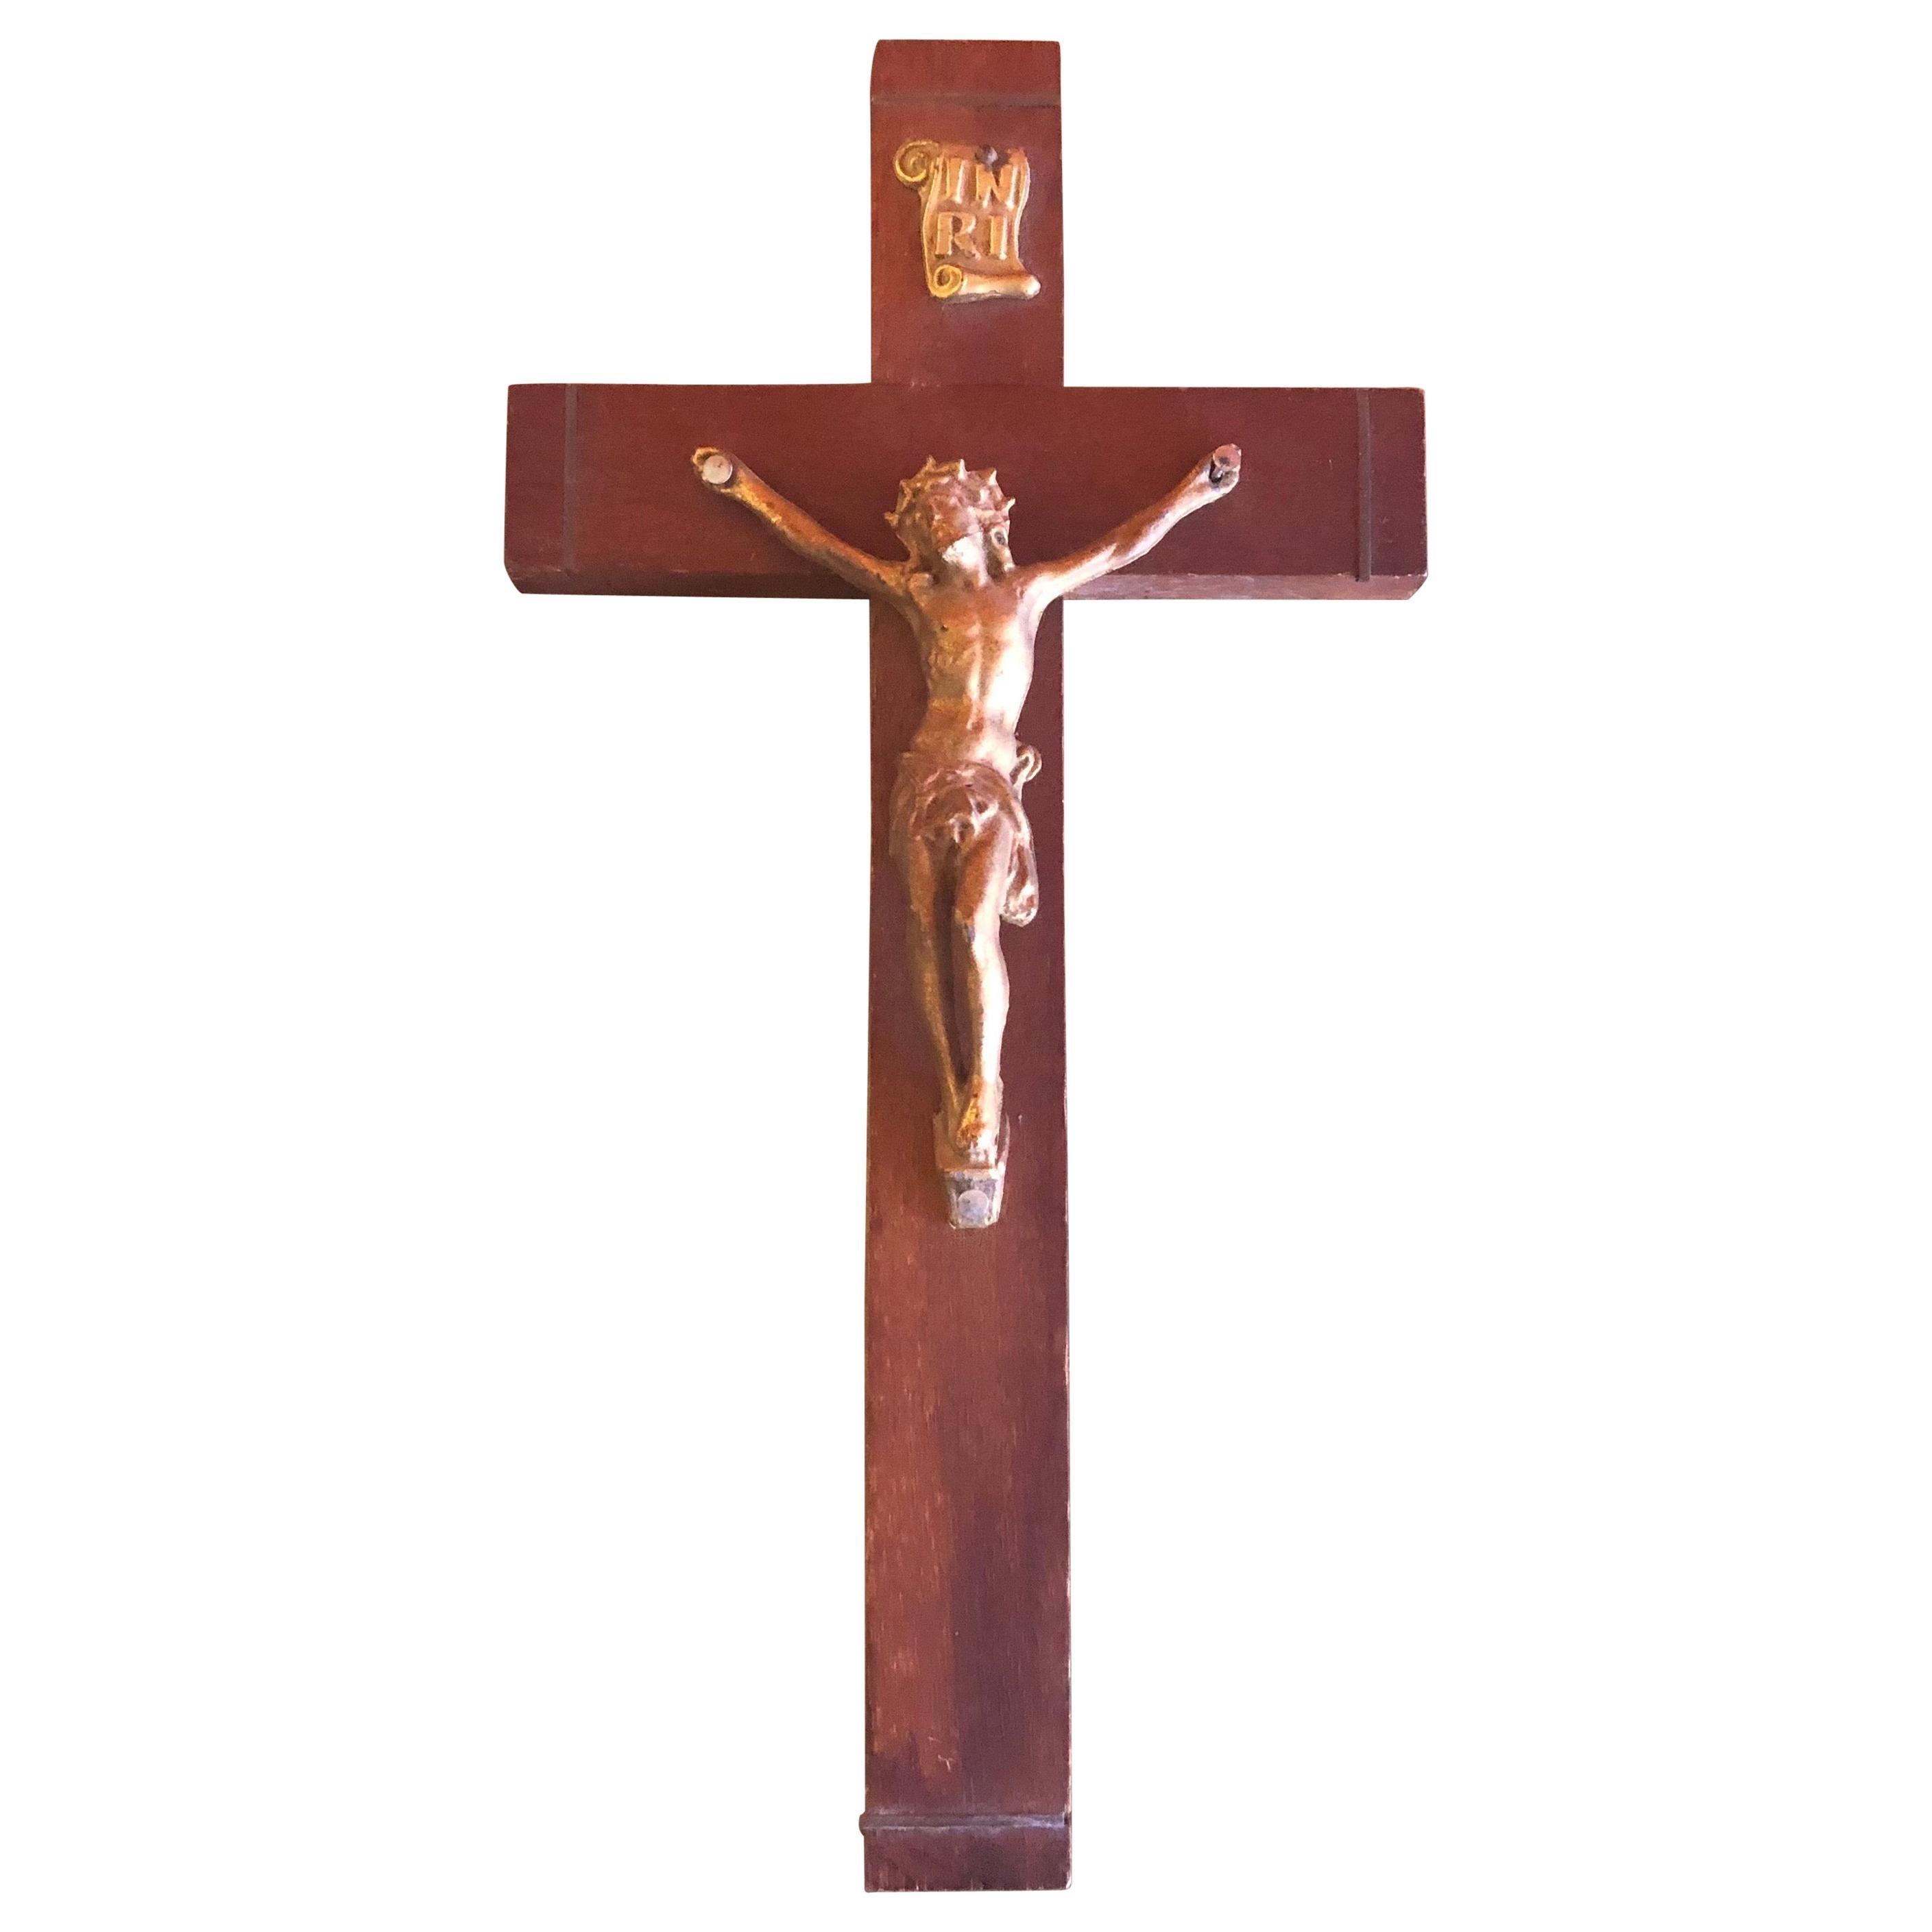 Midcentury Wood Crucifix